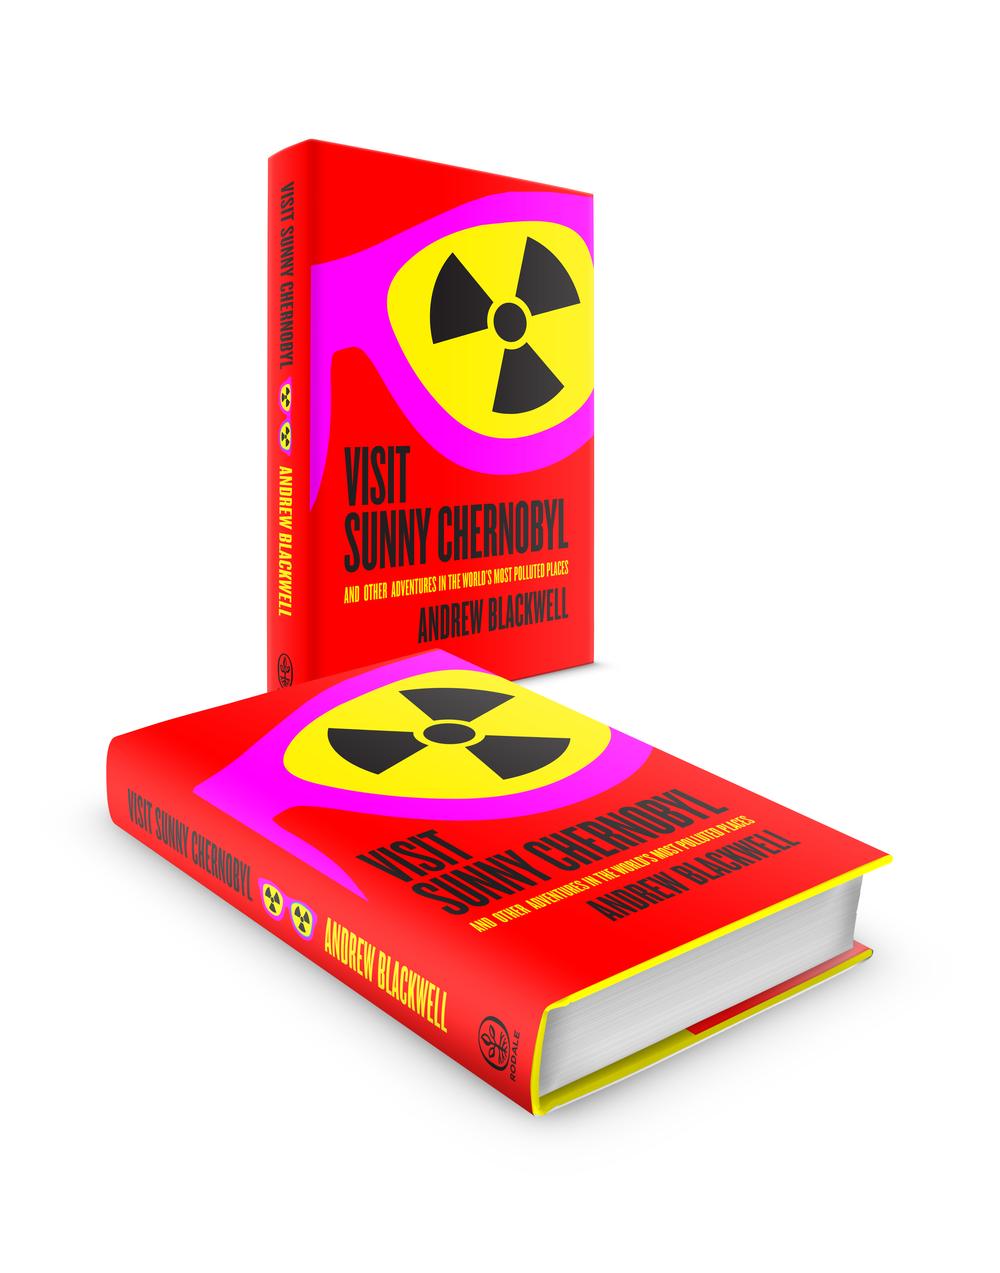 Visit Sunny Chernobyl by Andrew Blackwell